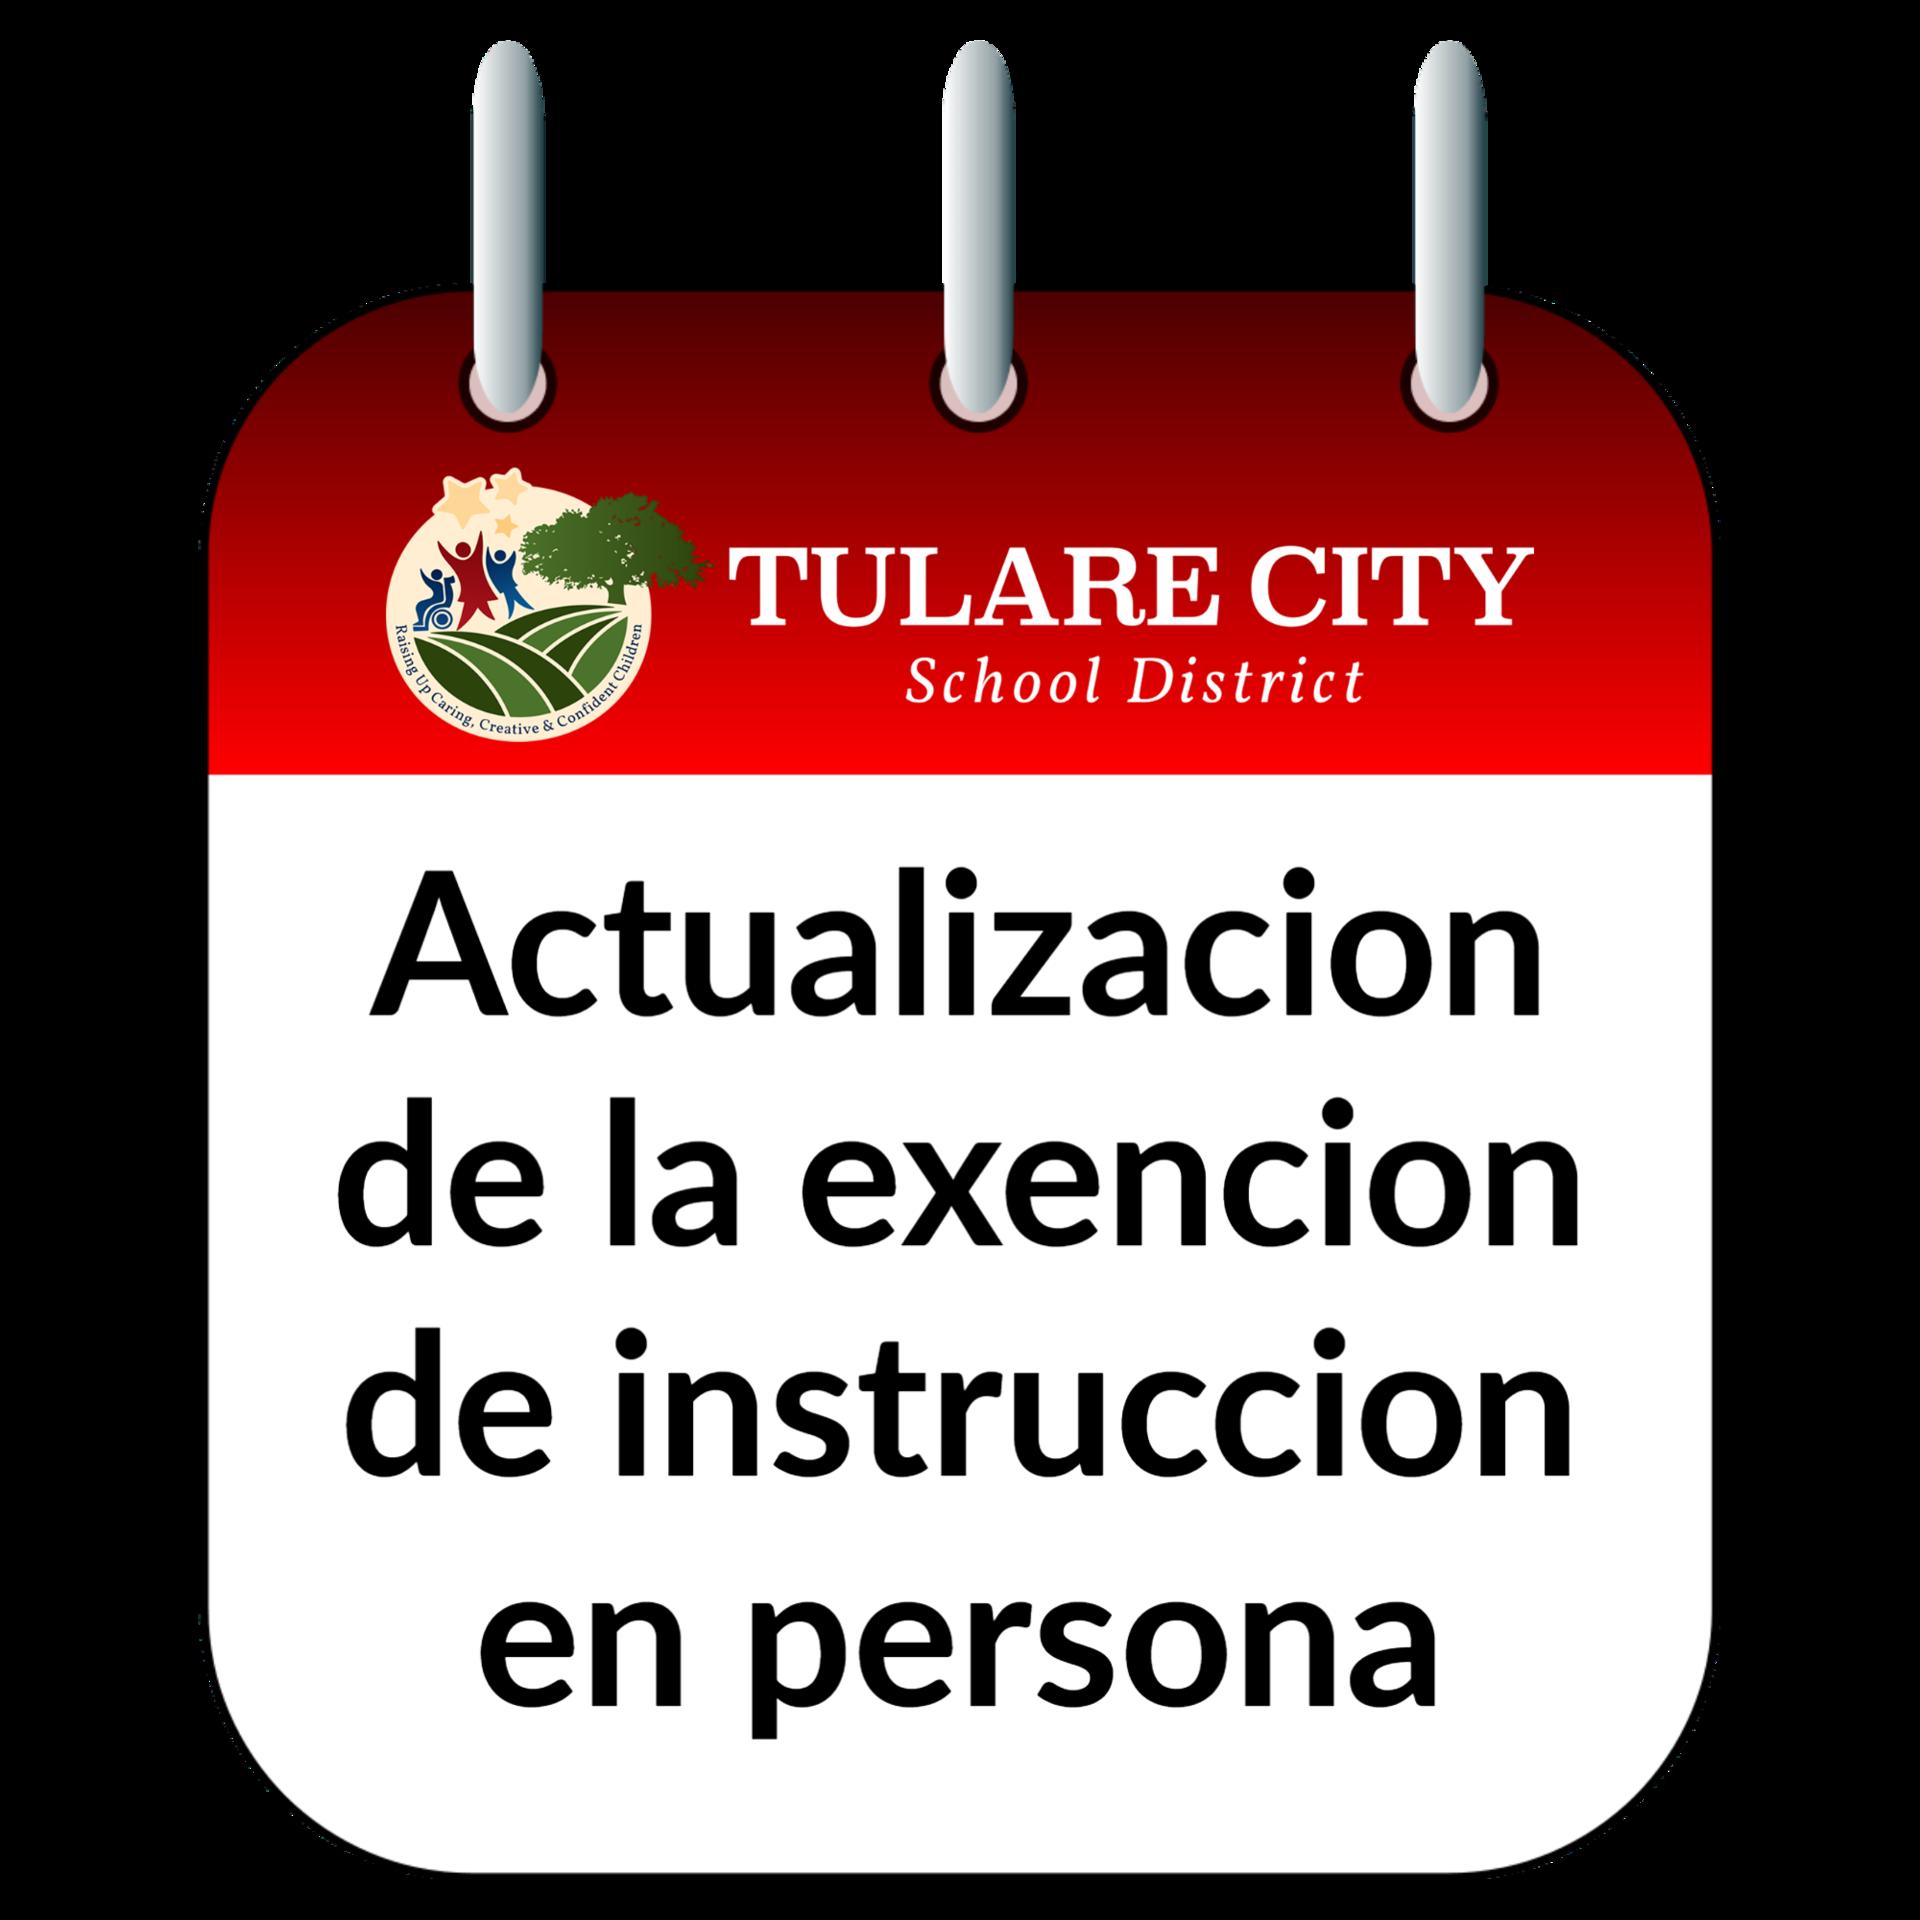 Image Spanish